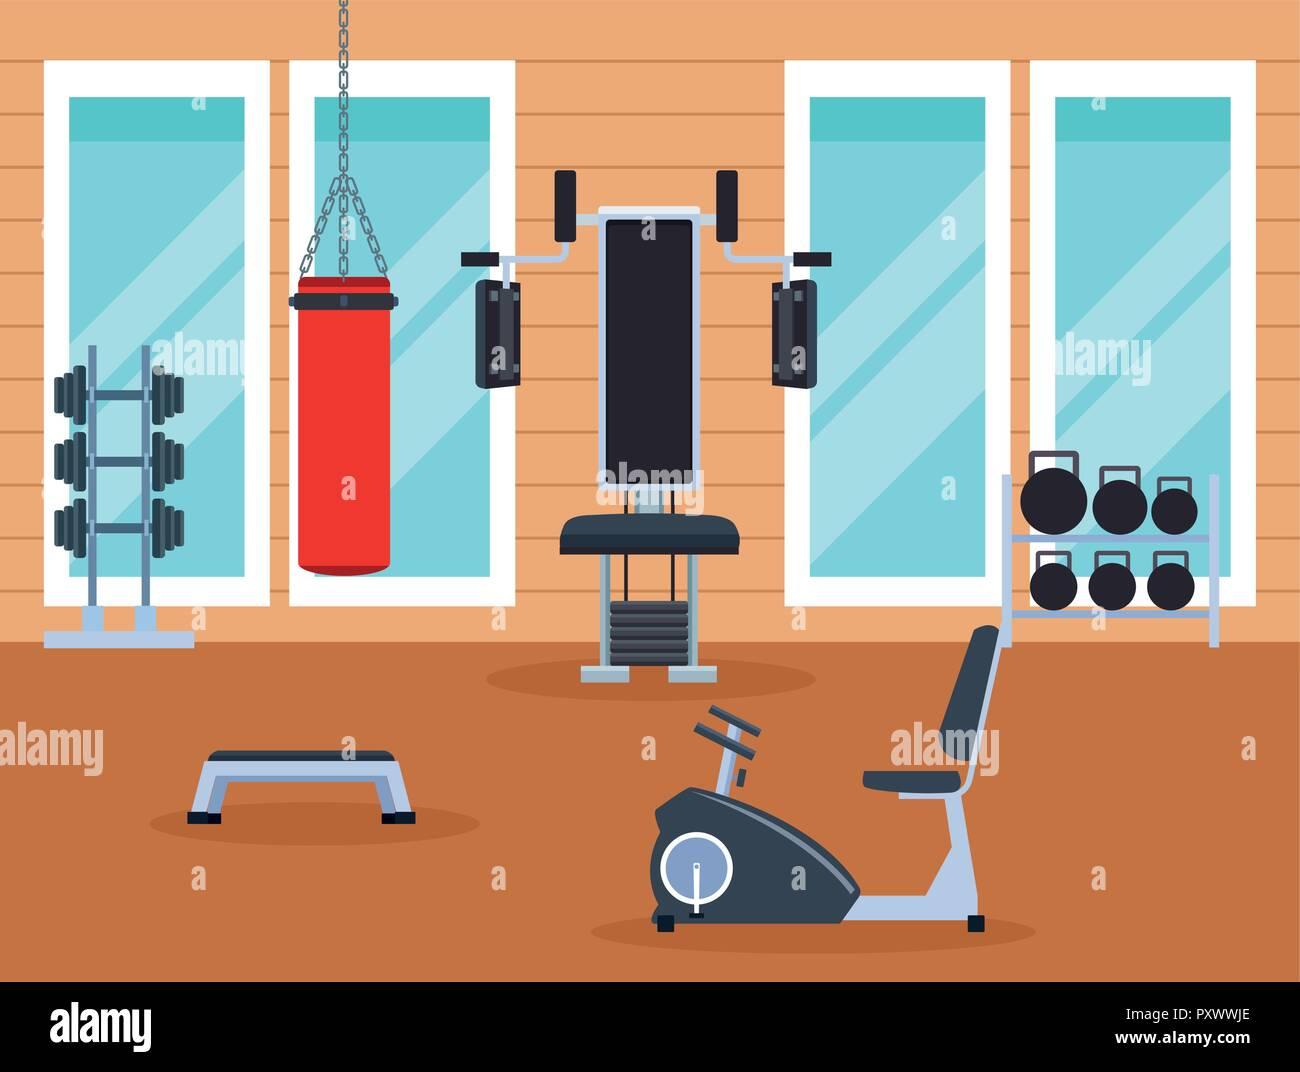 exercise machines cartoons - Stock Vector